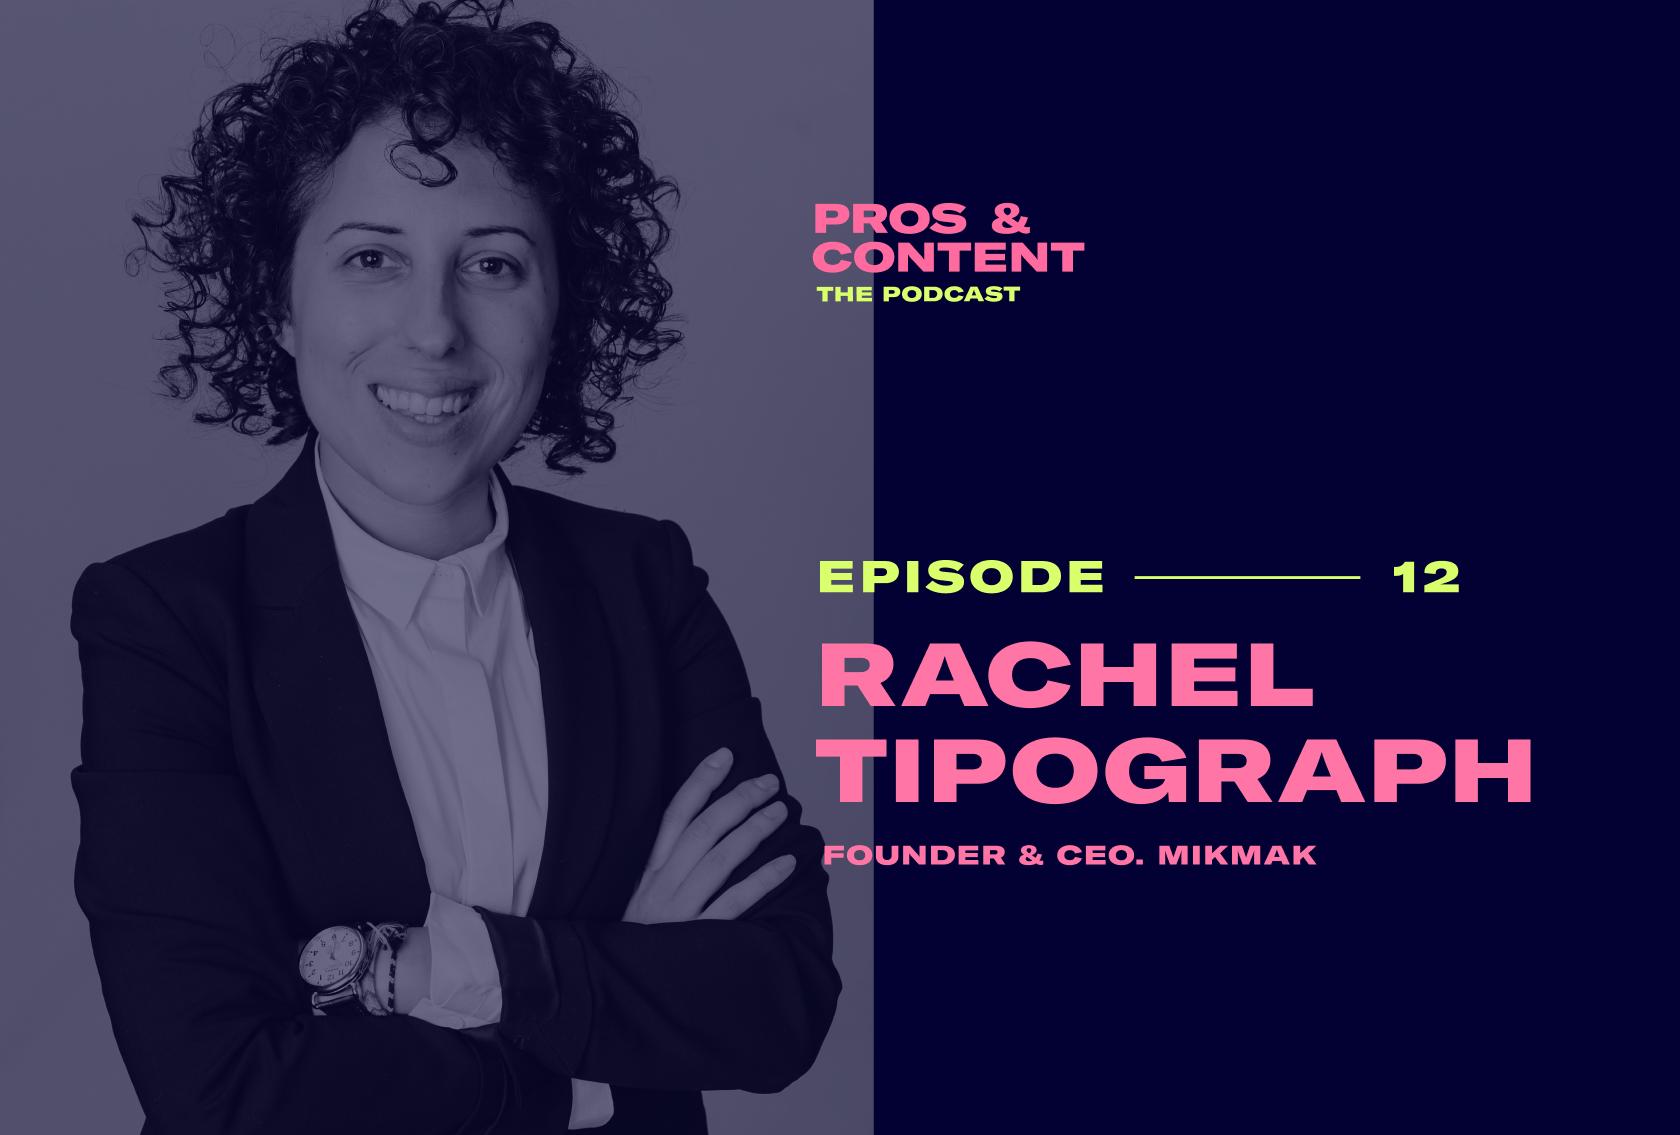 Pros & Content Podcast: Rachel Tipograph